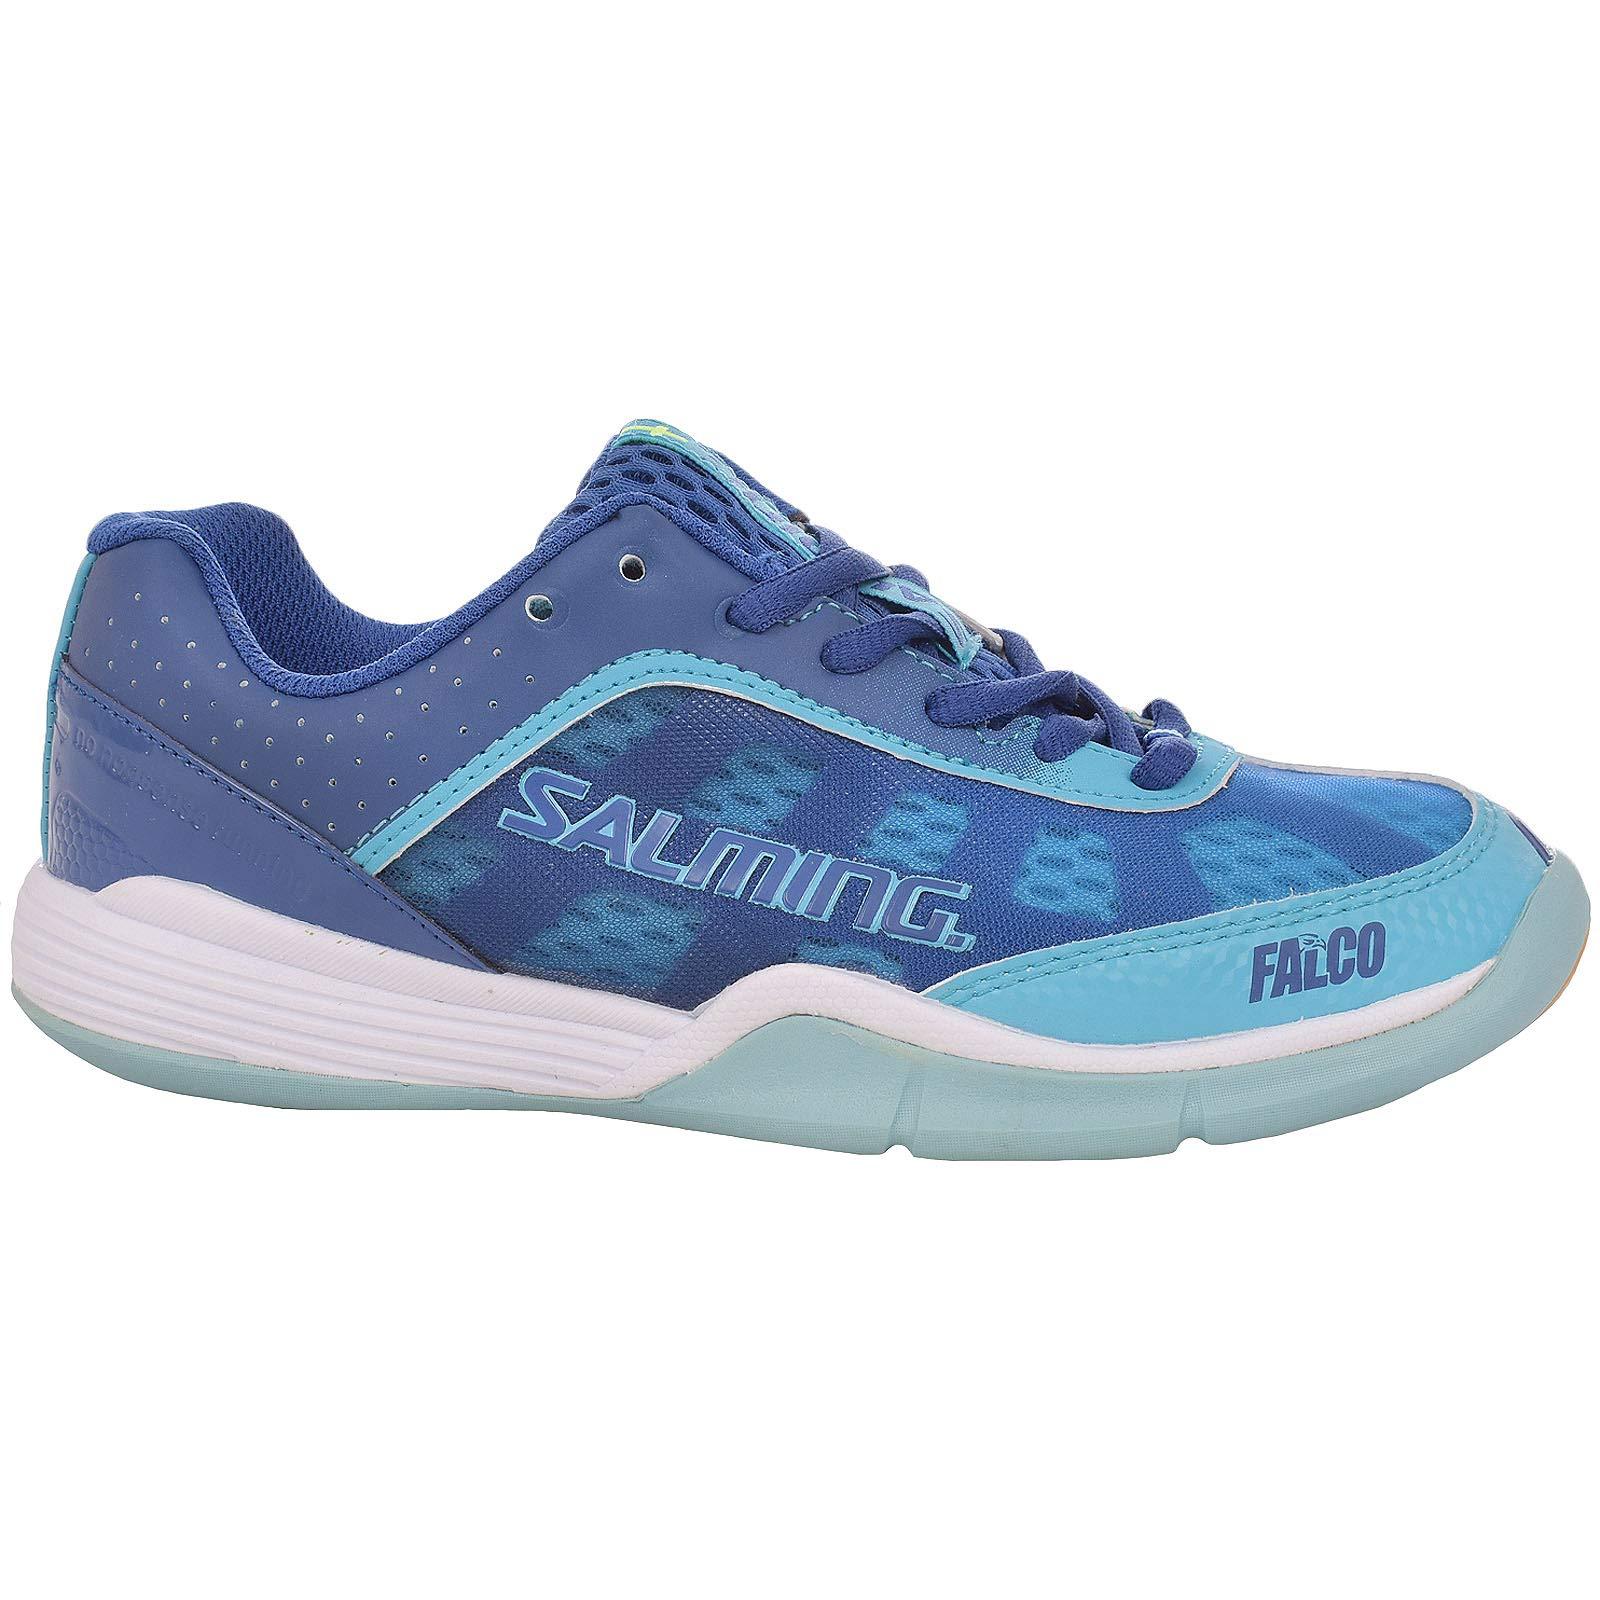 Salming Womens Falco Sports Trainers - Blue/Turqoise - 6 US